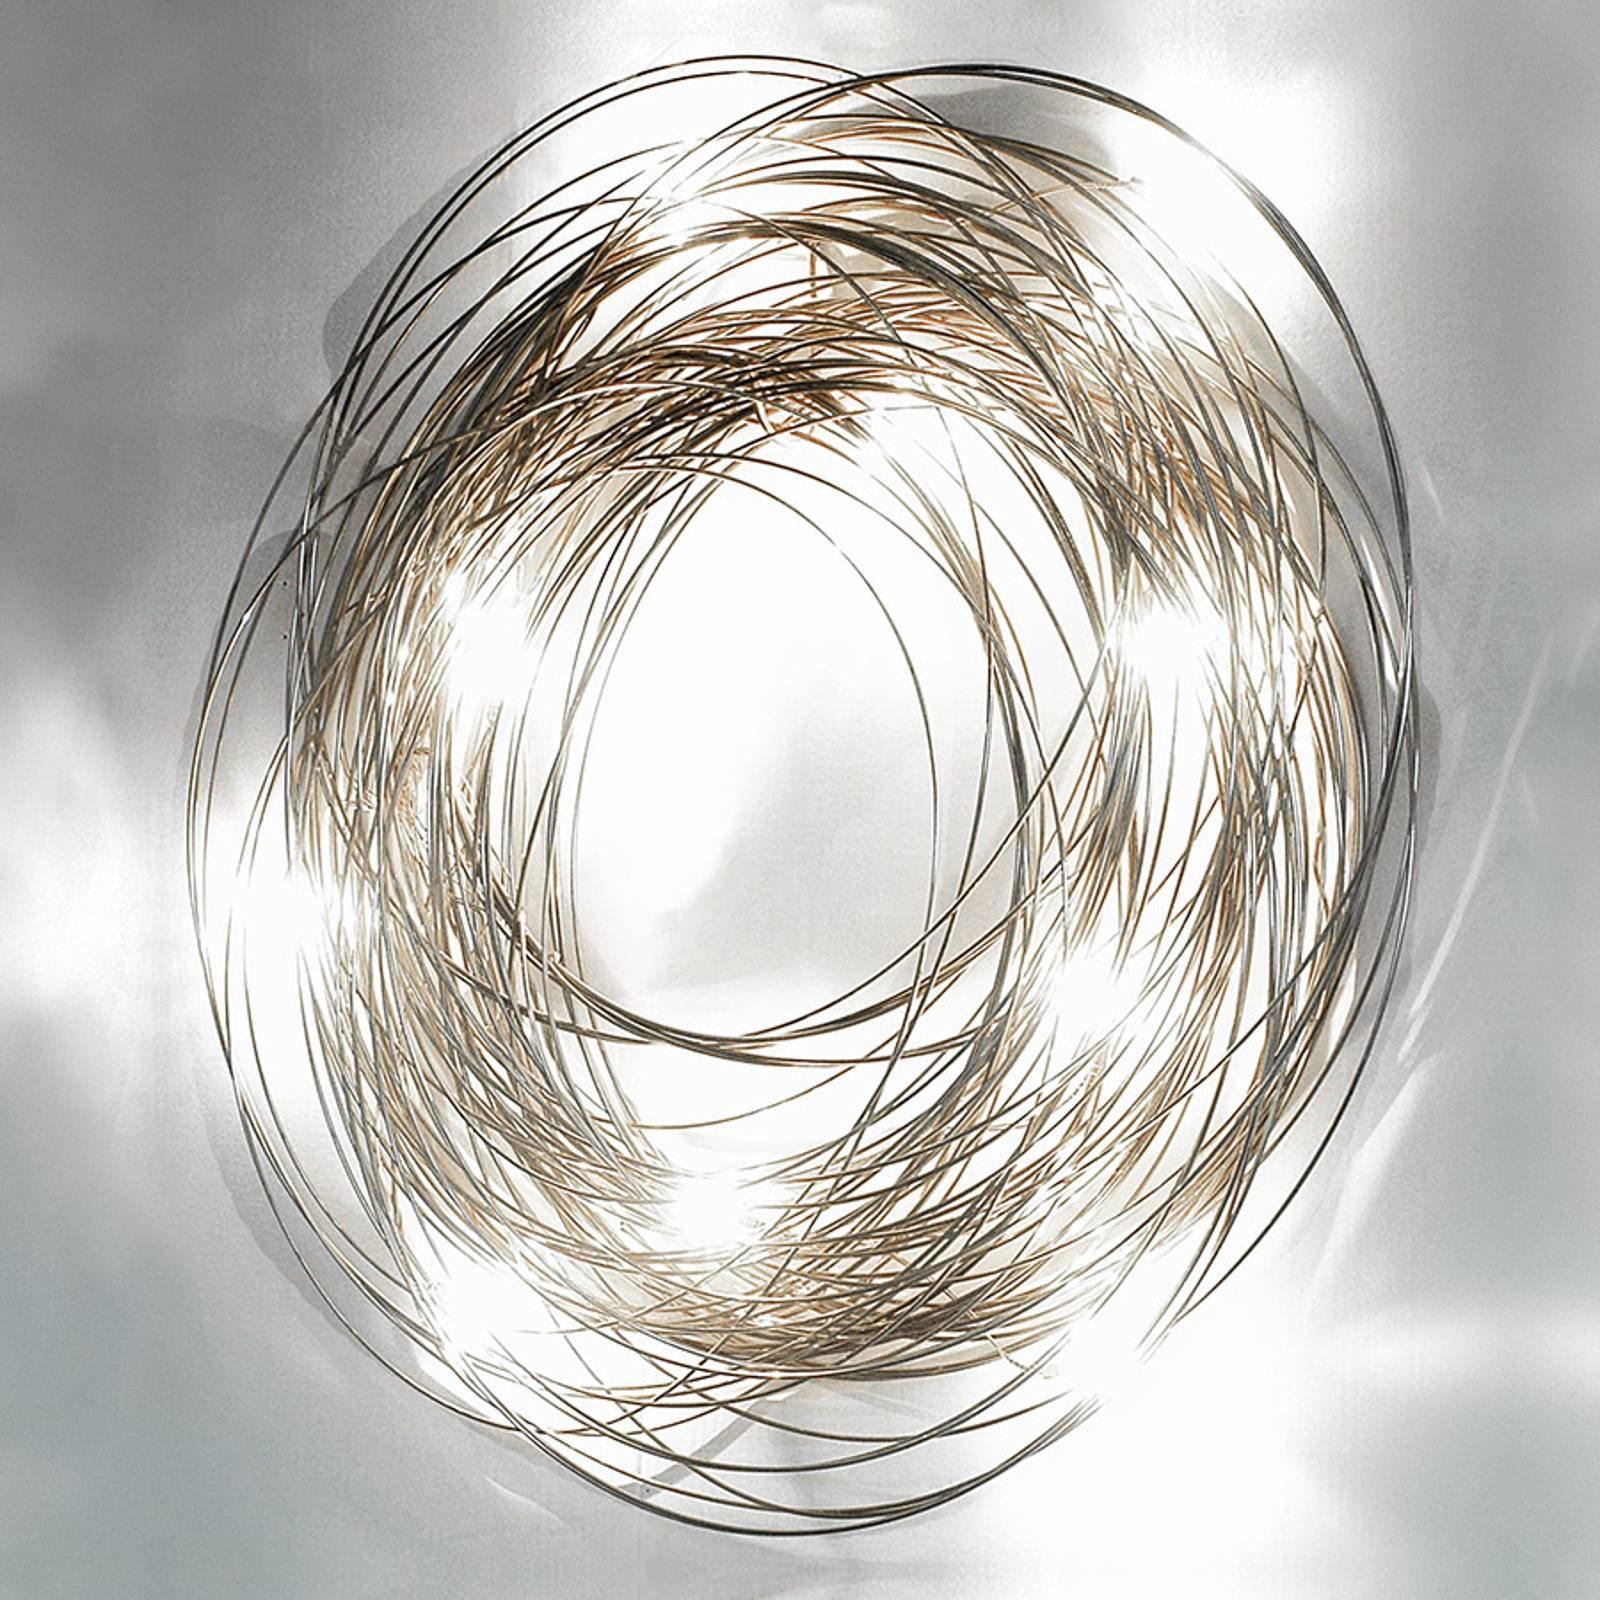 Raffinert vegglampe Confusione, 50 cm